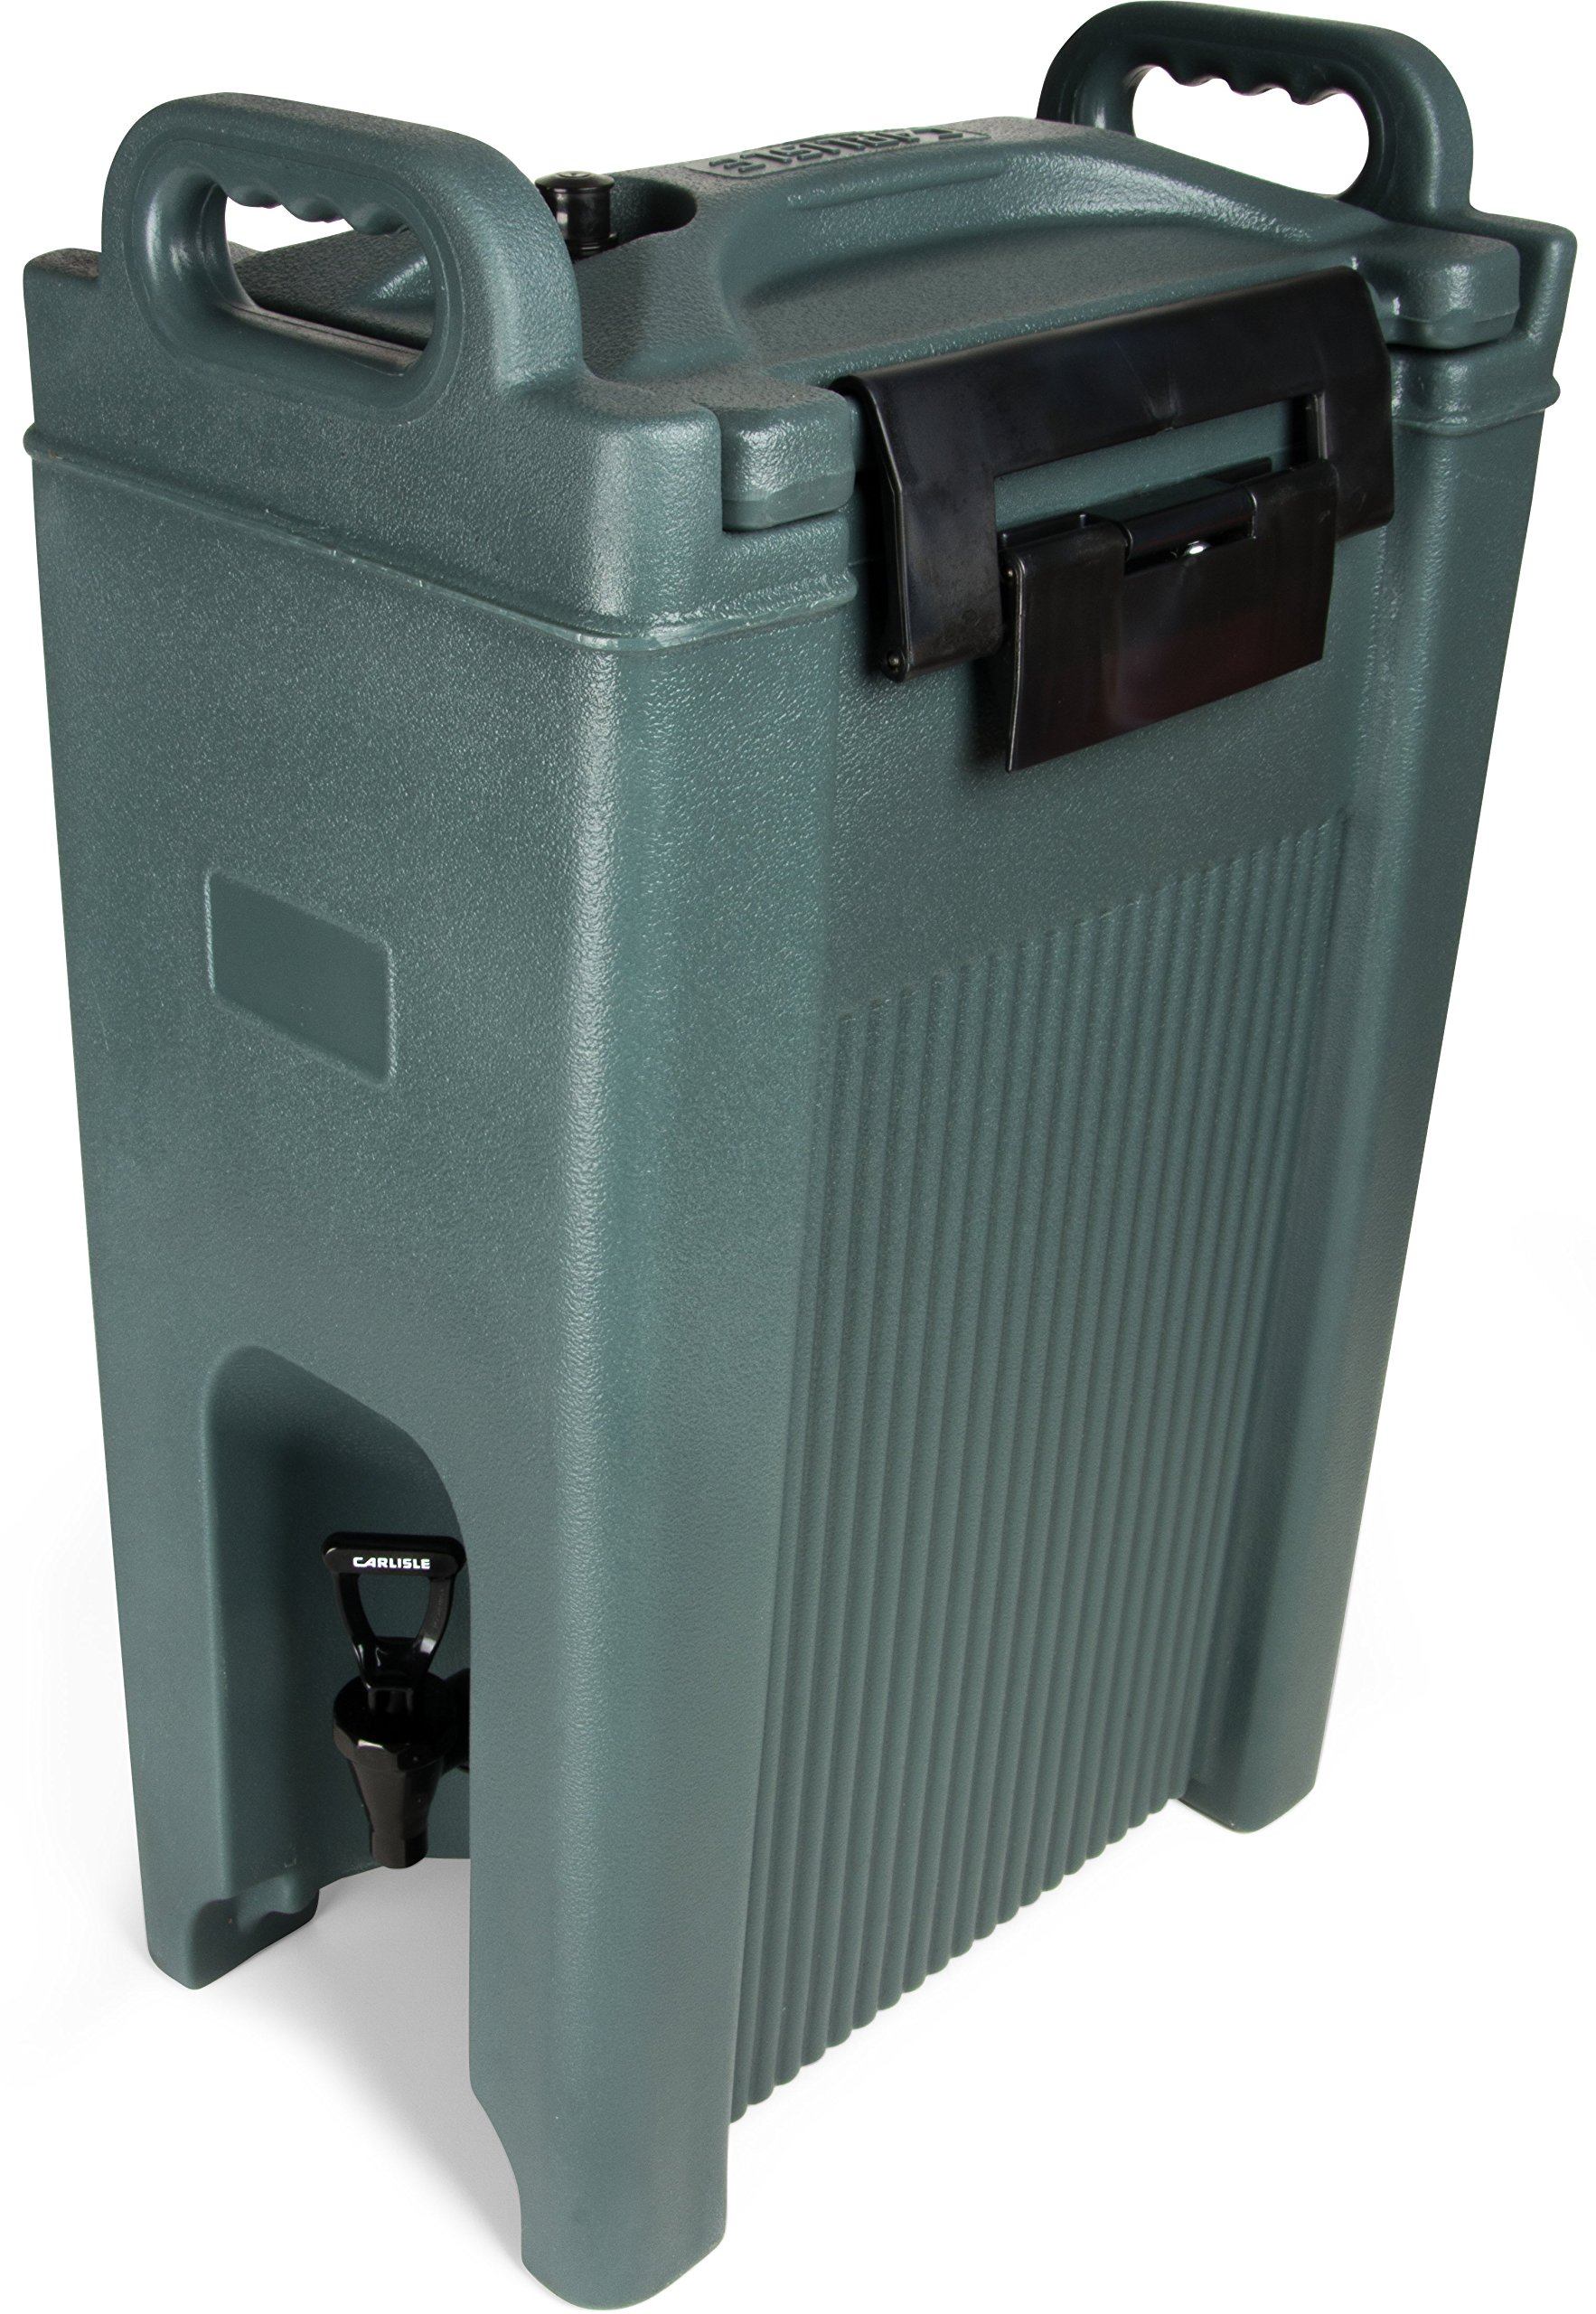 Carlisle XT500059 Cateraide Insulated Beverage Server Dispenser, 5 Gallon, Slate Blue